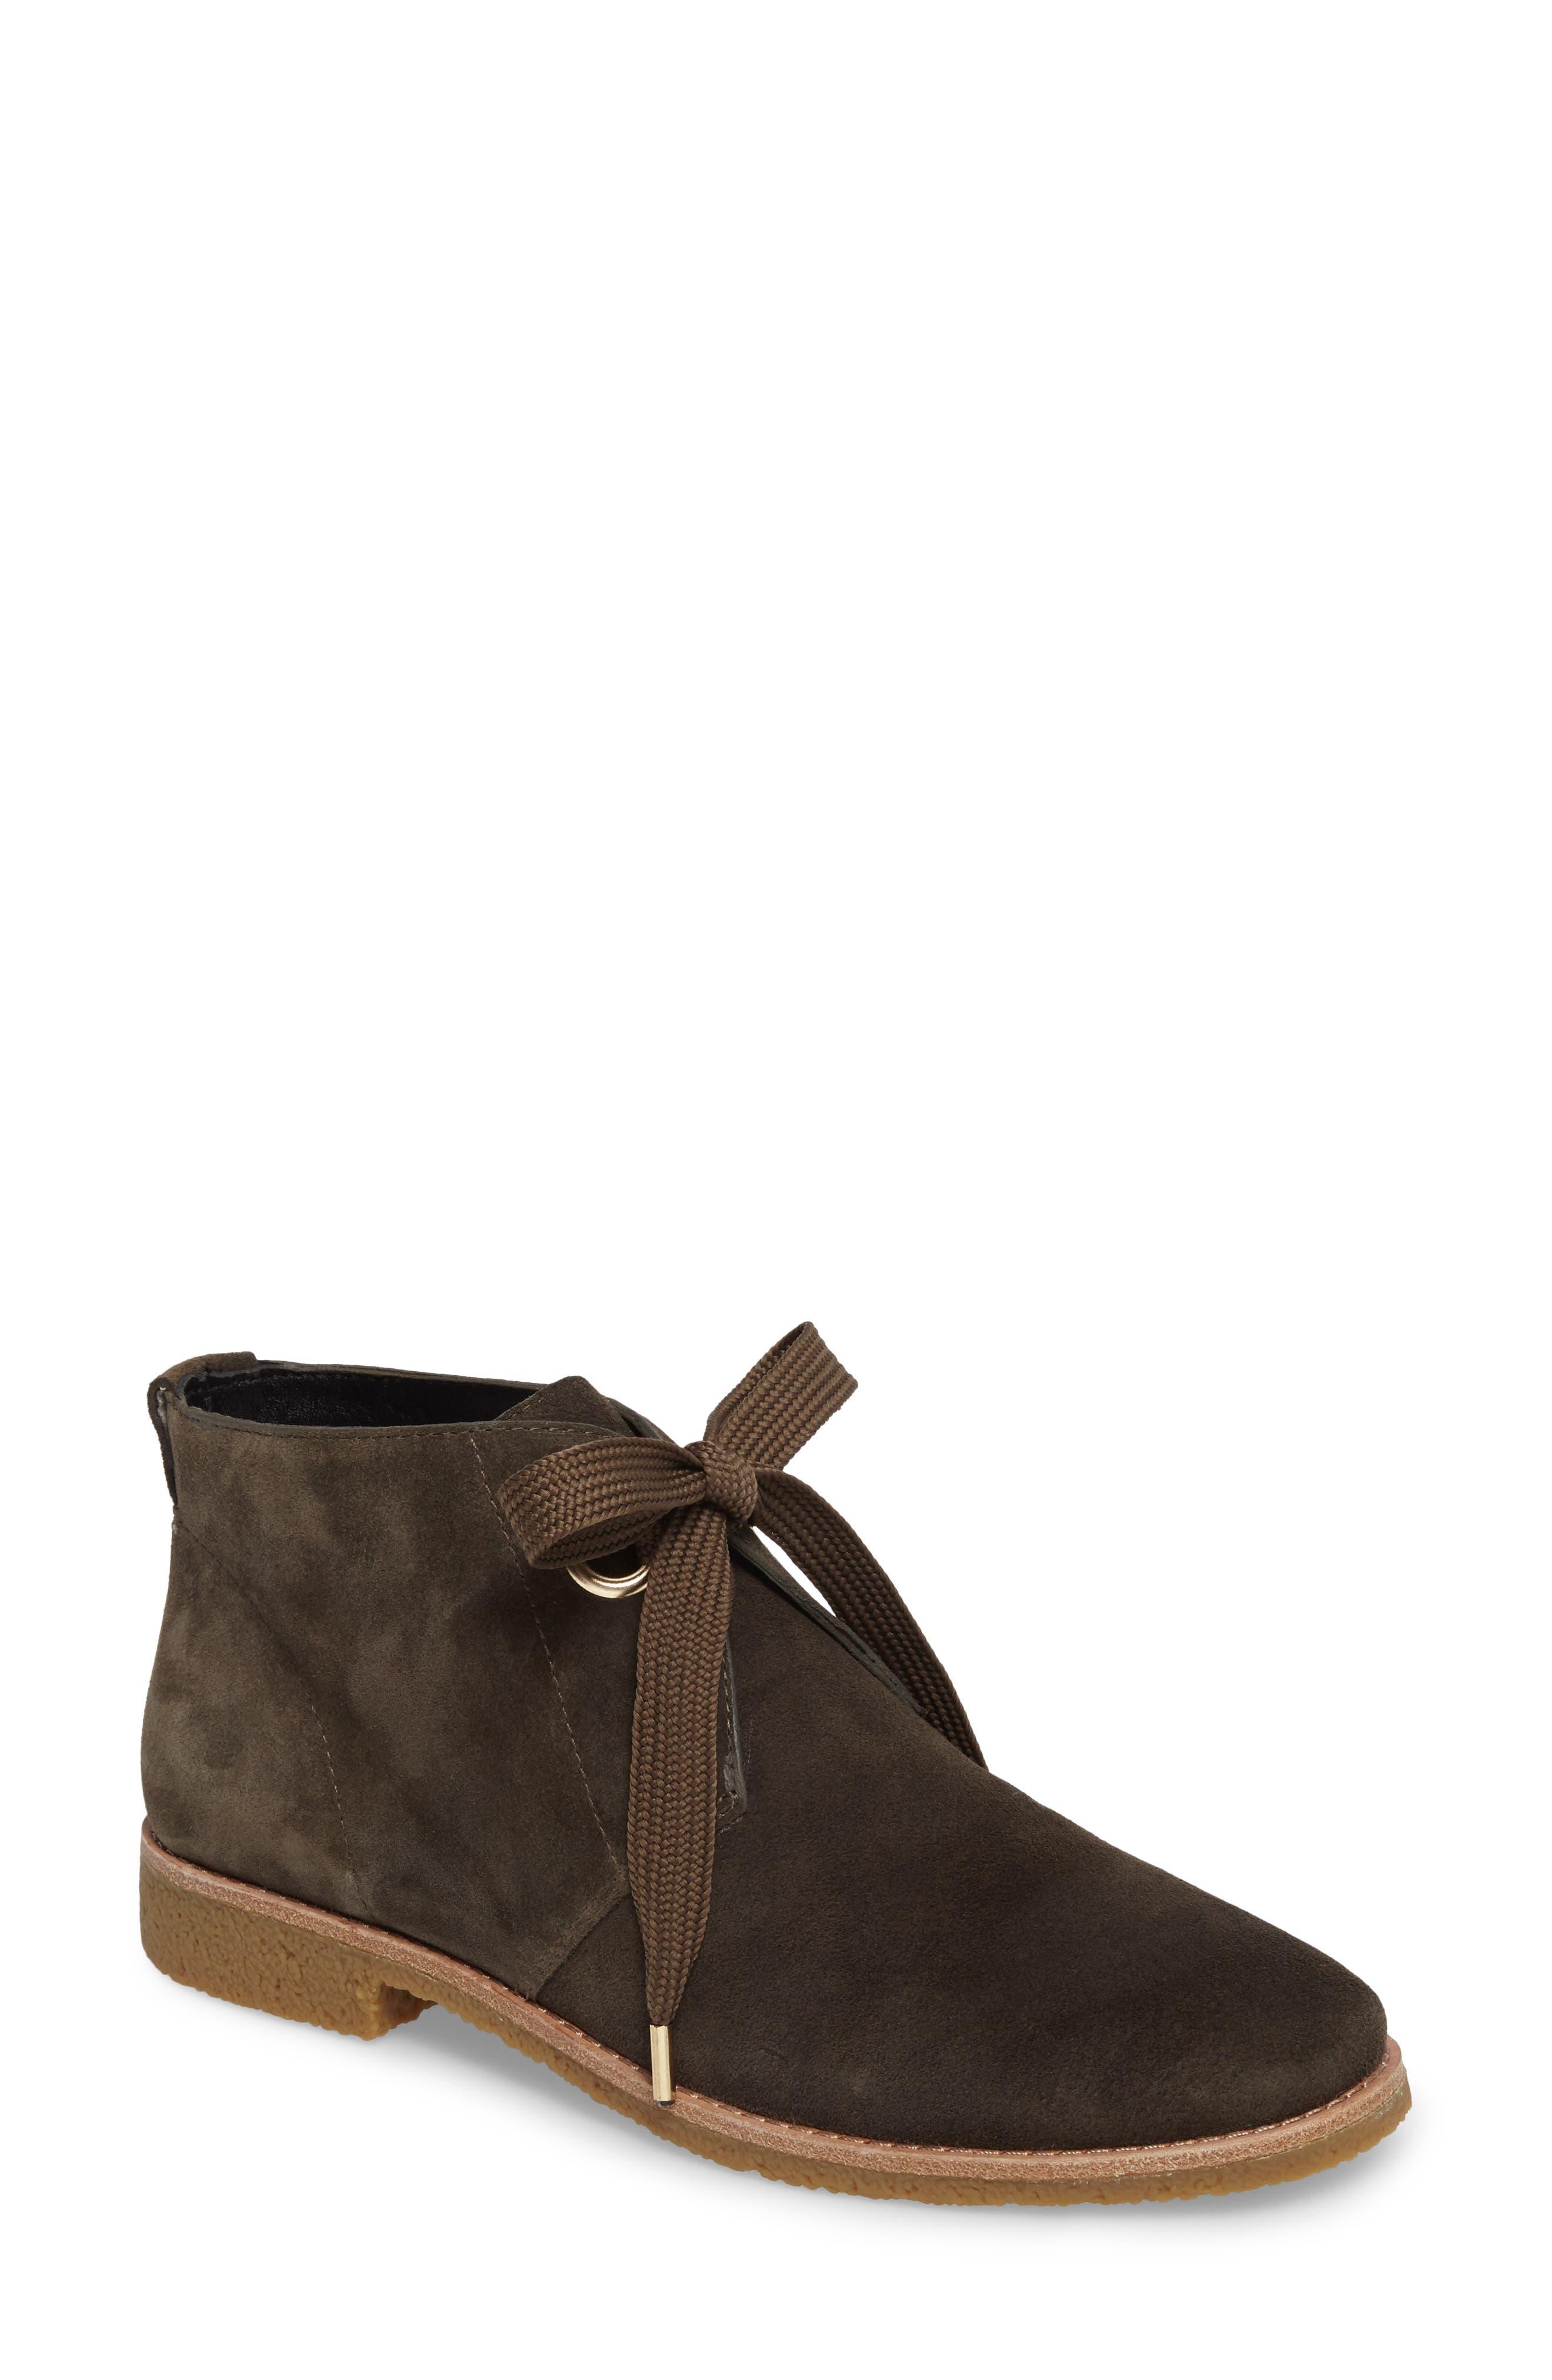 barrow chukka boot,                             Main thumbnail 1, color,                             Olive Green Suede